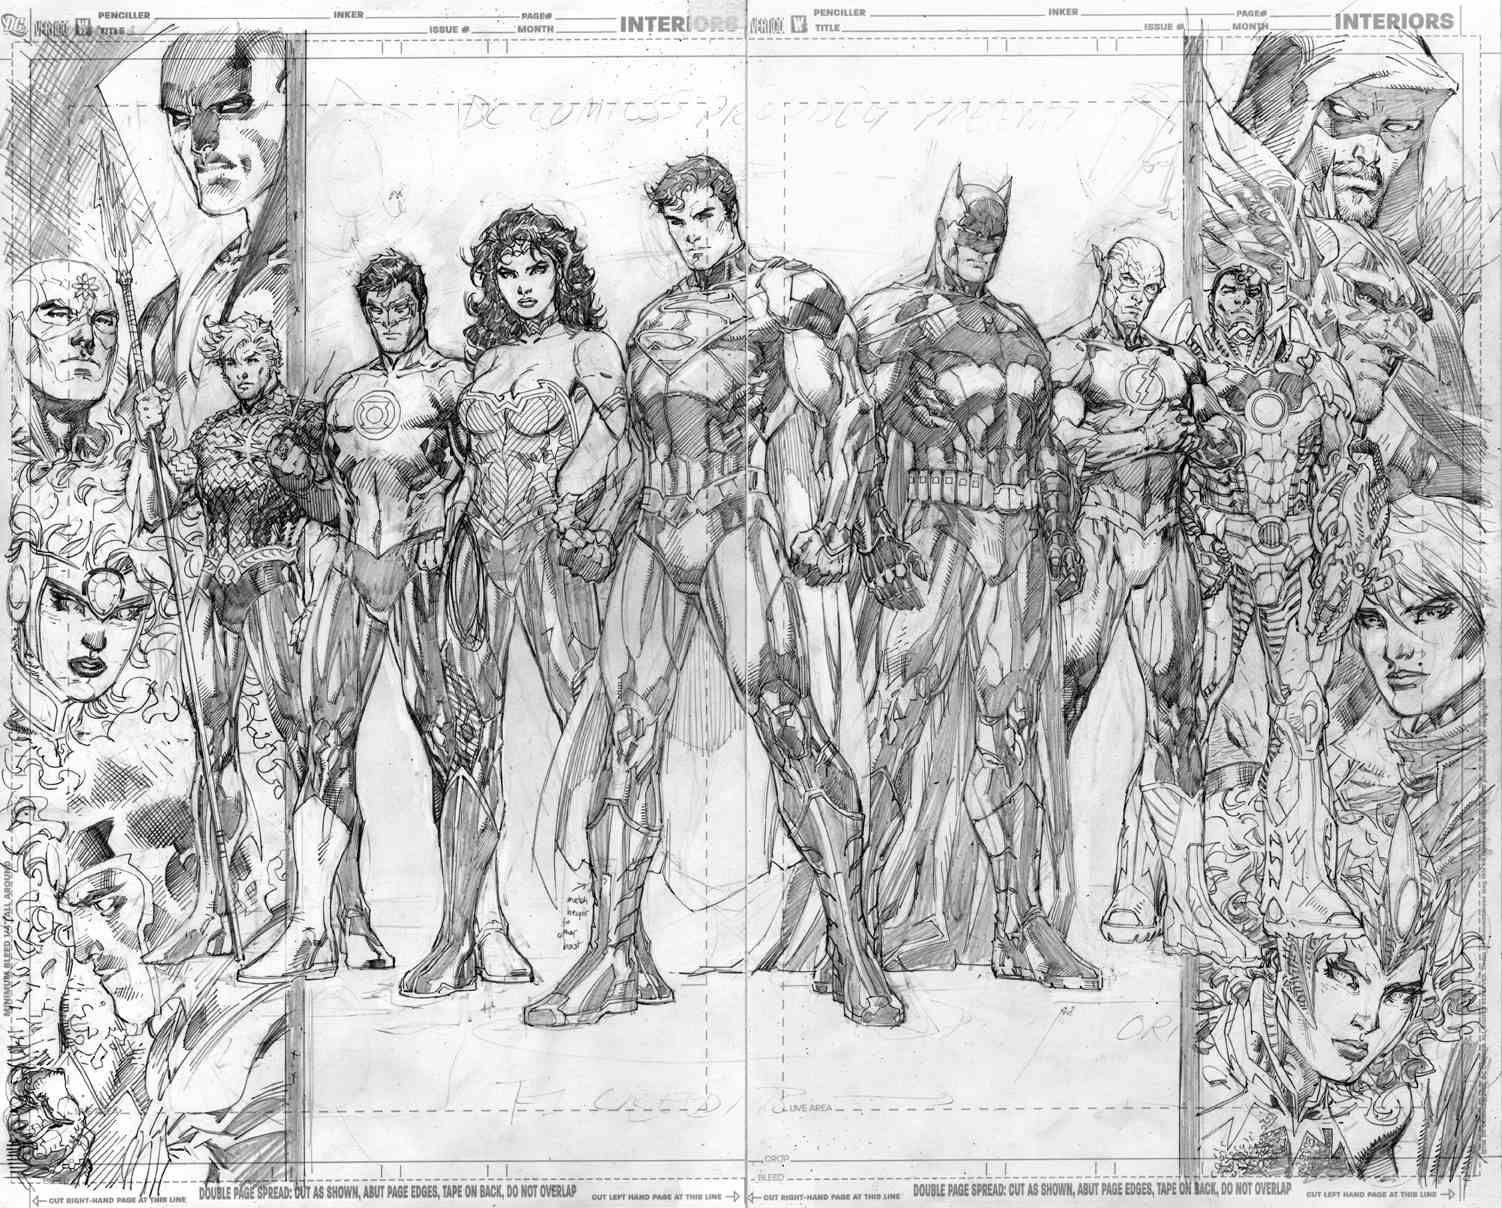 Justice League By Jim Lee Pencils Jim Lee Art Jim Lee Comic Artist